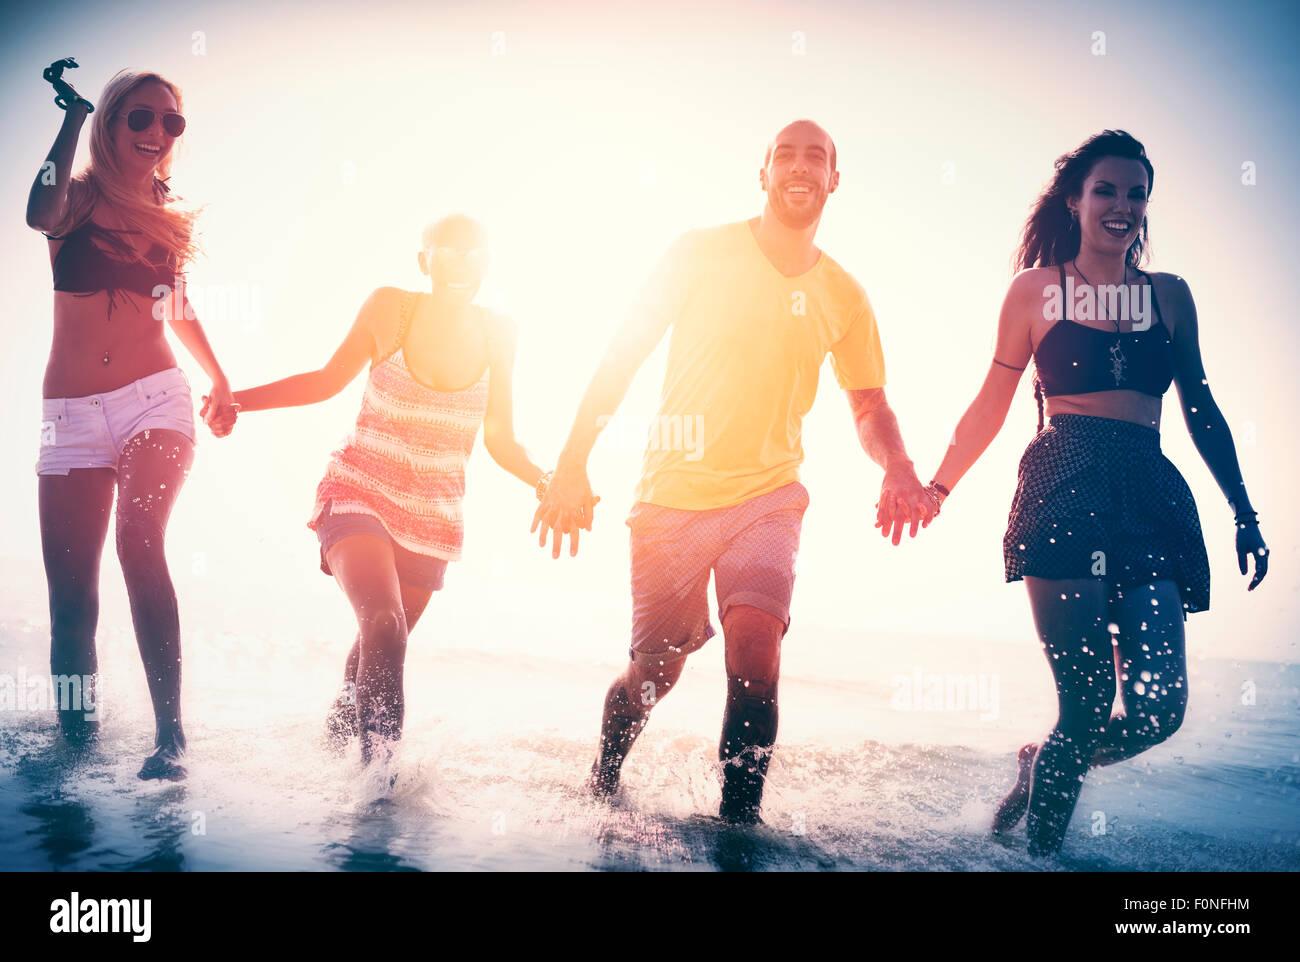 Freundschaft Freedom Beach Sommerurlaub Konzept Stockbild